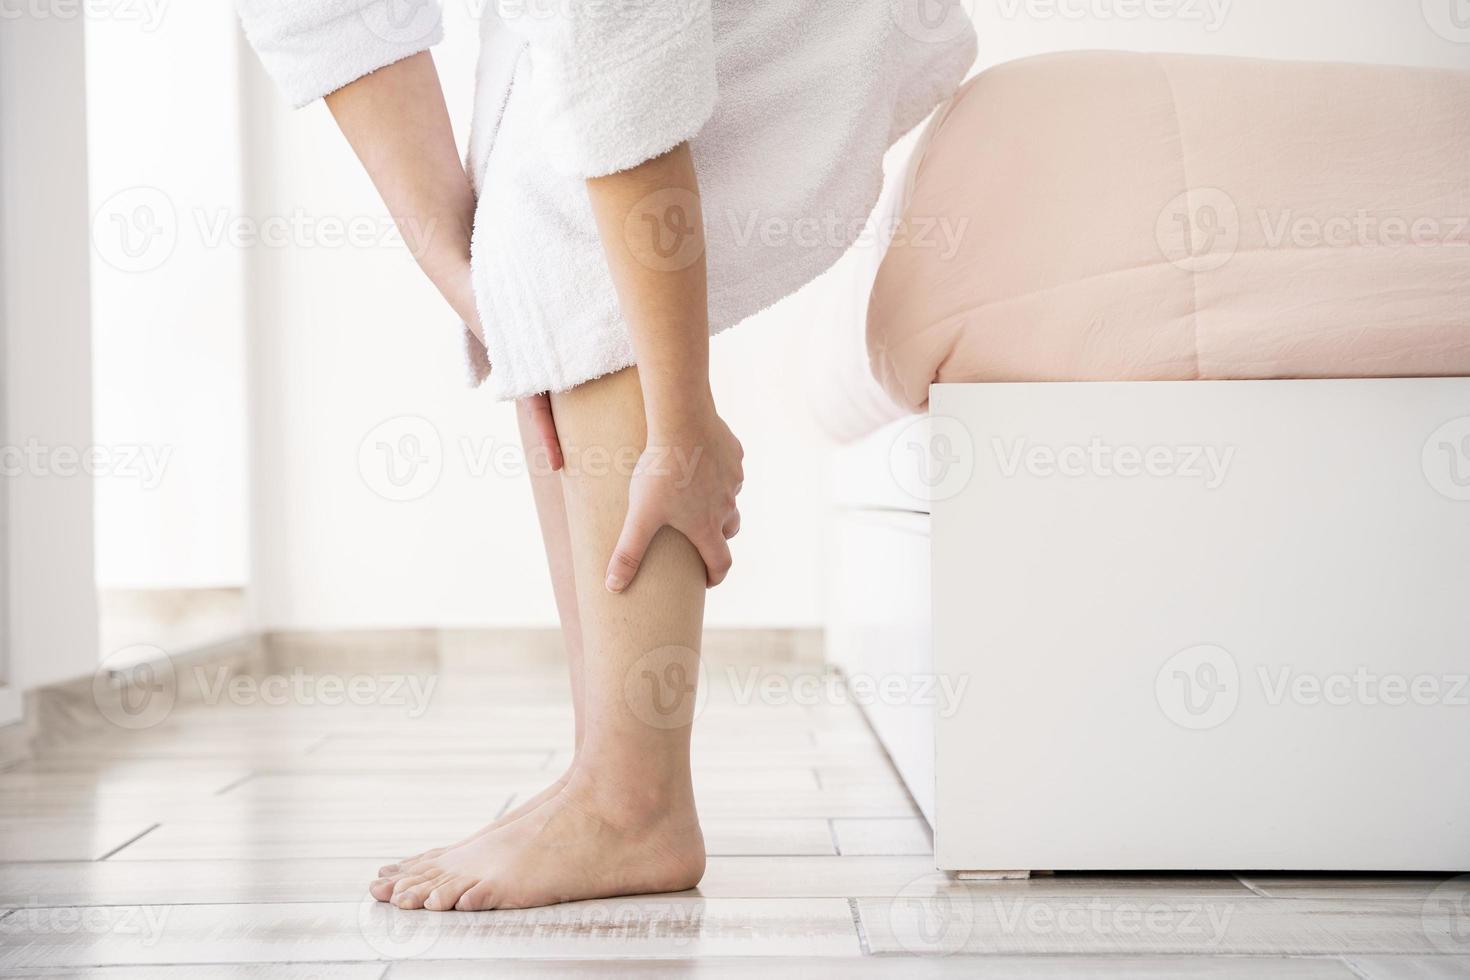 närbild händer massera ben foto